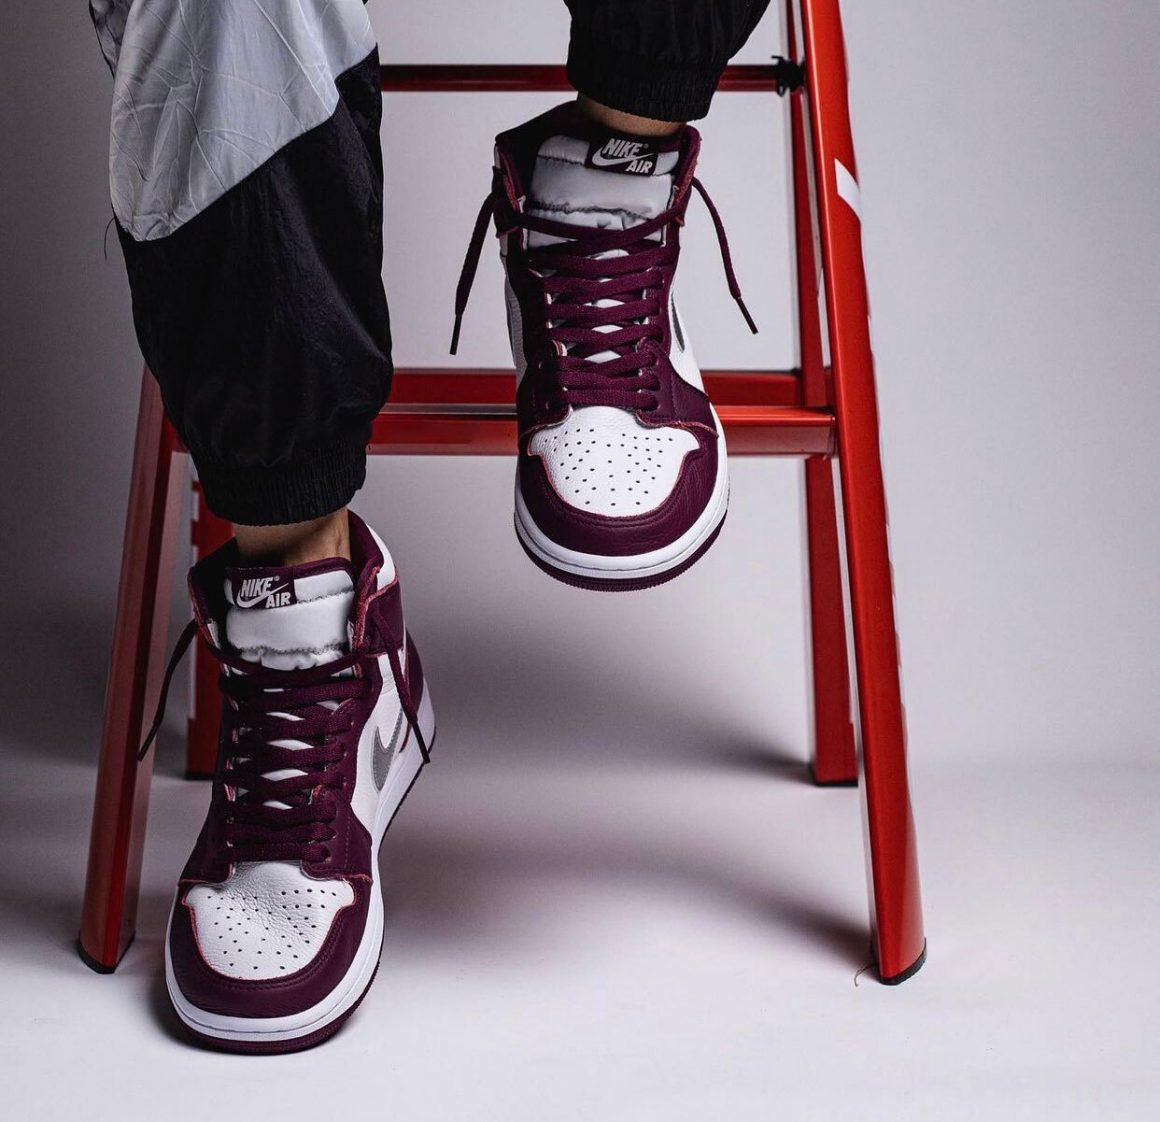 Air Jordan 1 Retro High OG ''Bordeaux'' - 555088-611